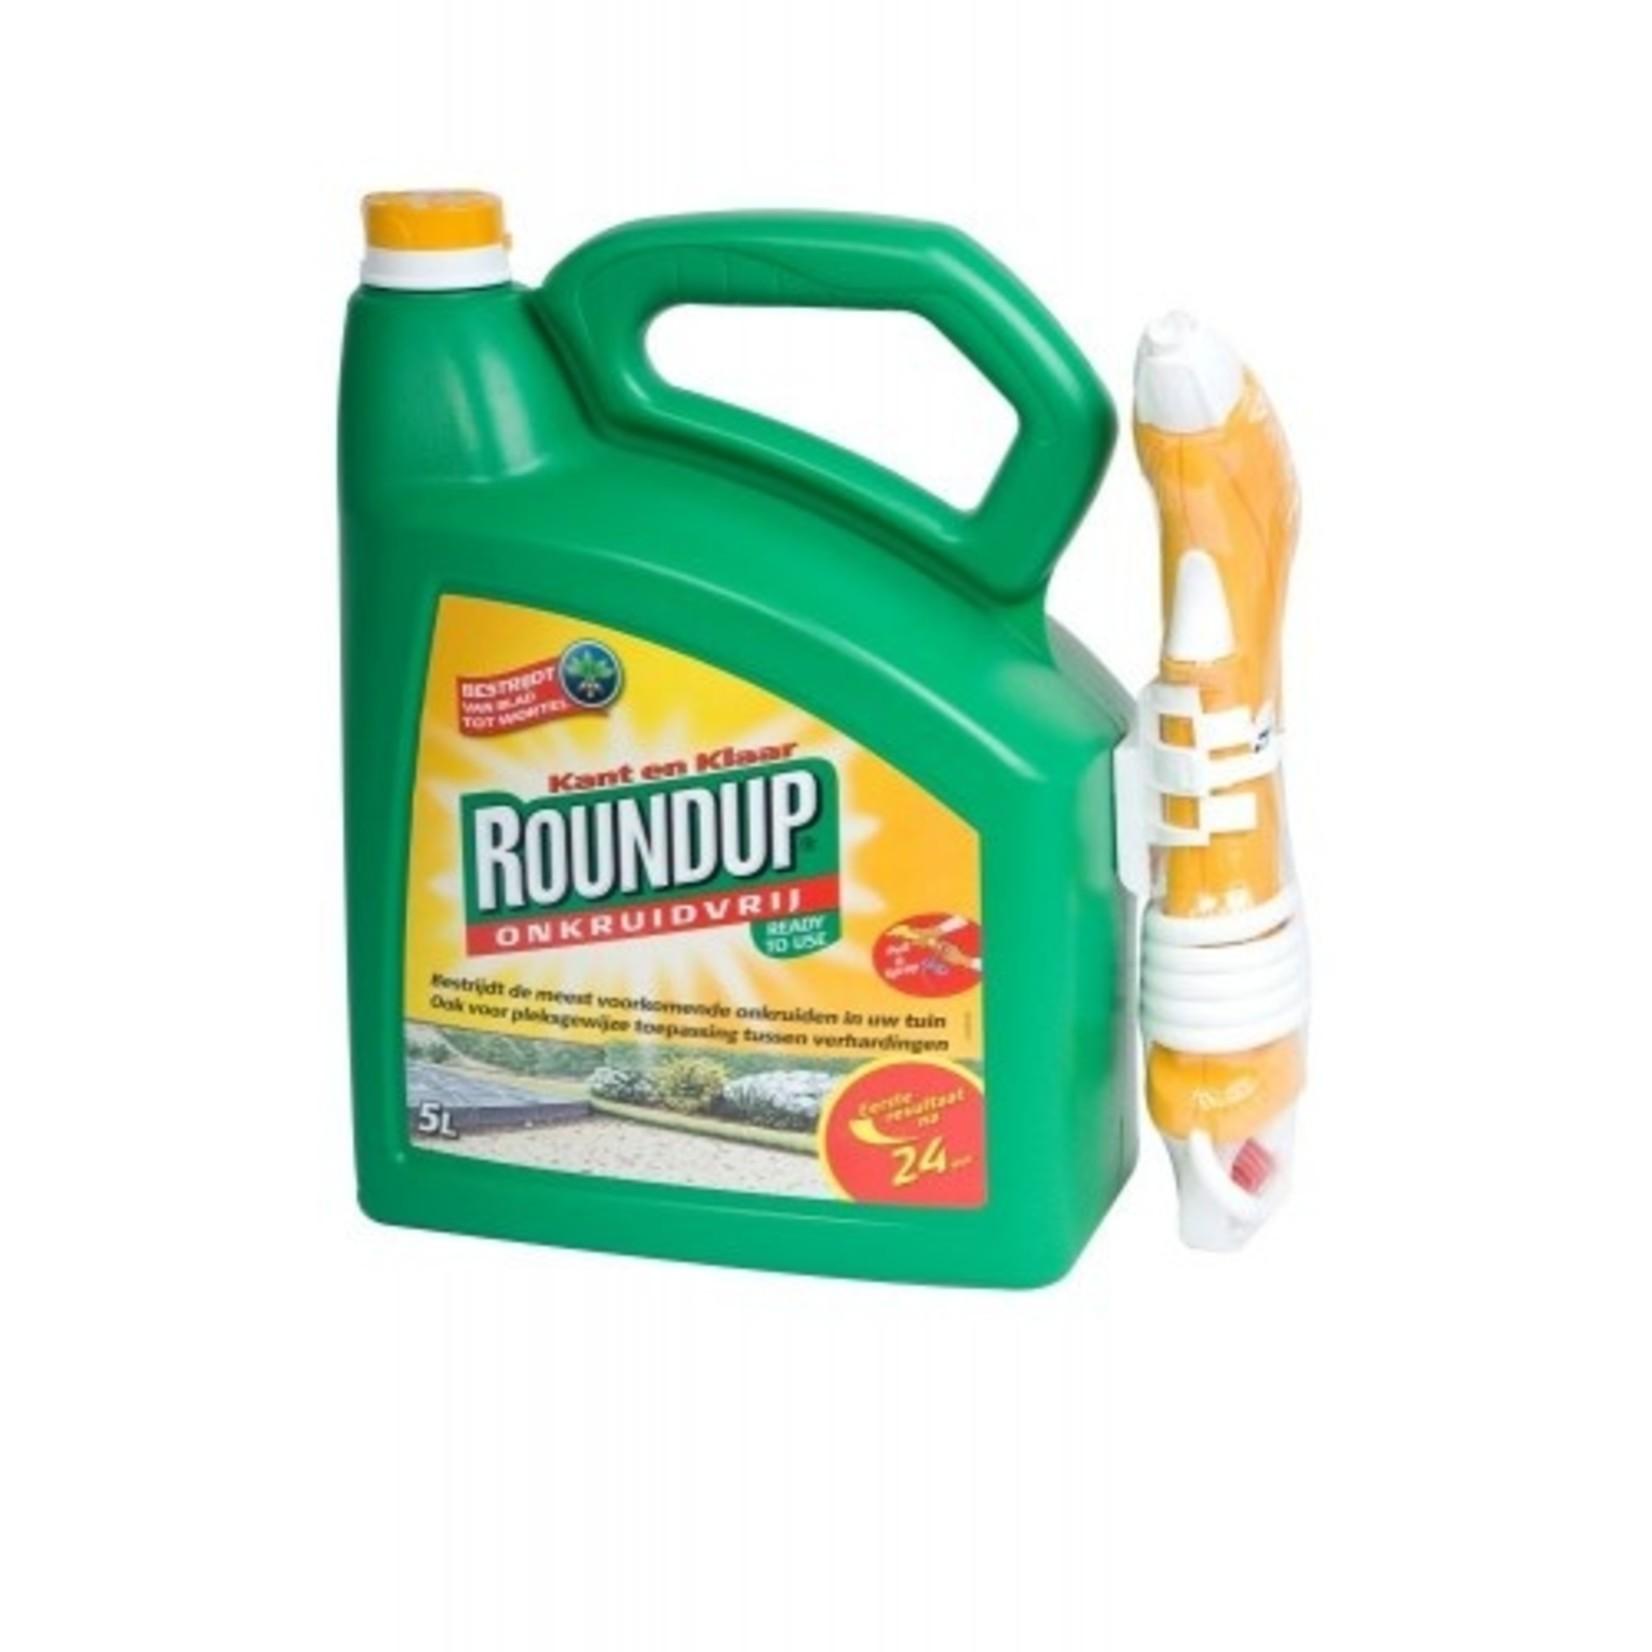 Round-up Trek & Spuit 5000 ml (spray) tegen onkruid